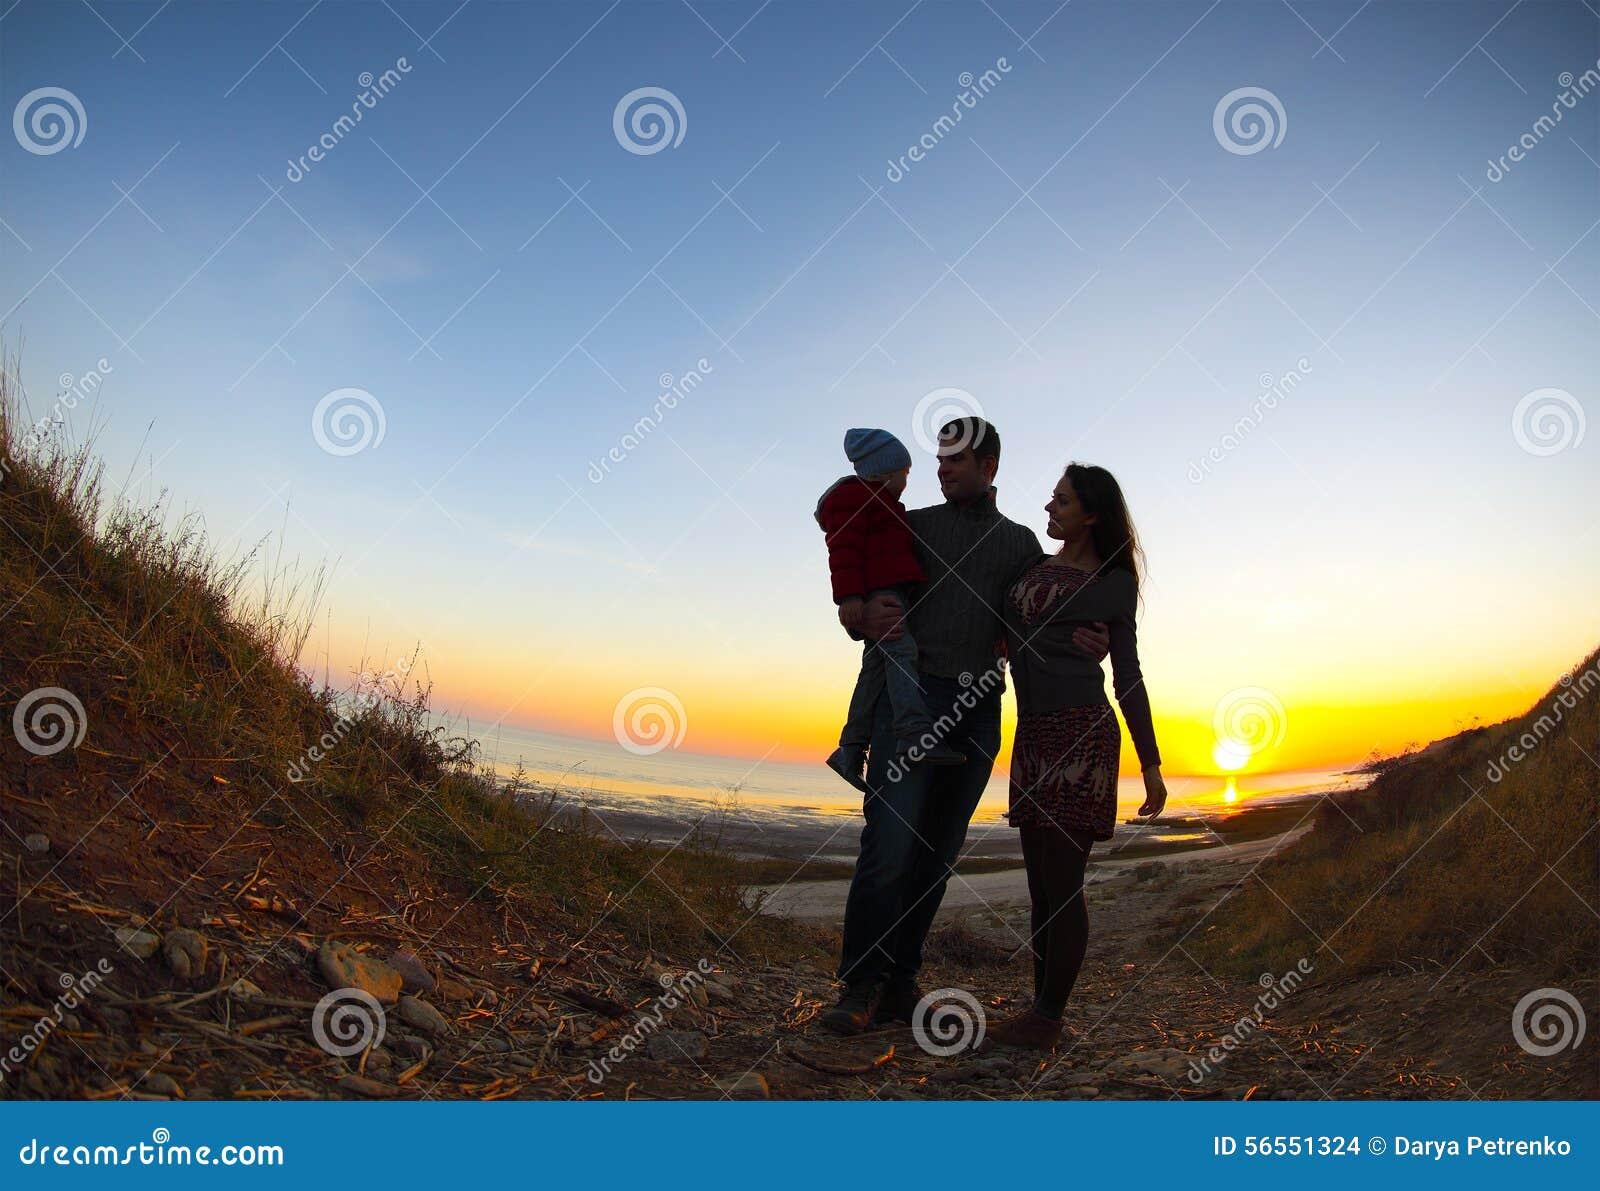 Download Σκιαγραφία δύο ευτυχών ενηλίκων και ενός παιδιού Στοκ Εικόνες - εικόνα από οικογένεια, babylonia: 56551324